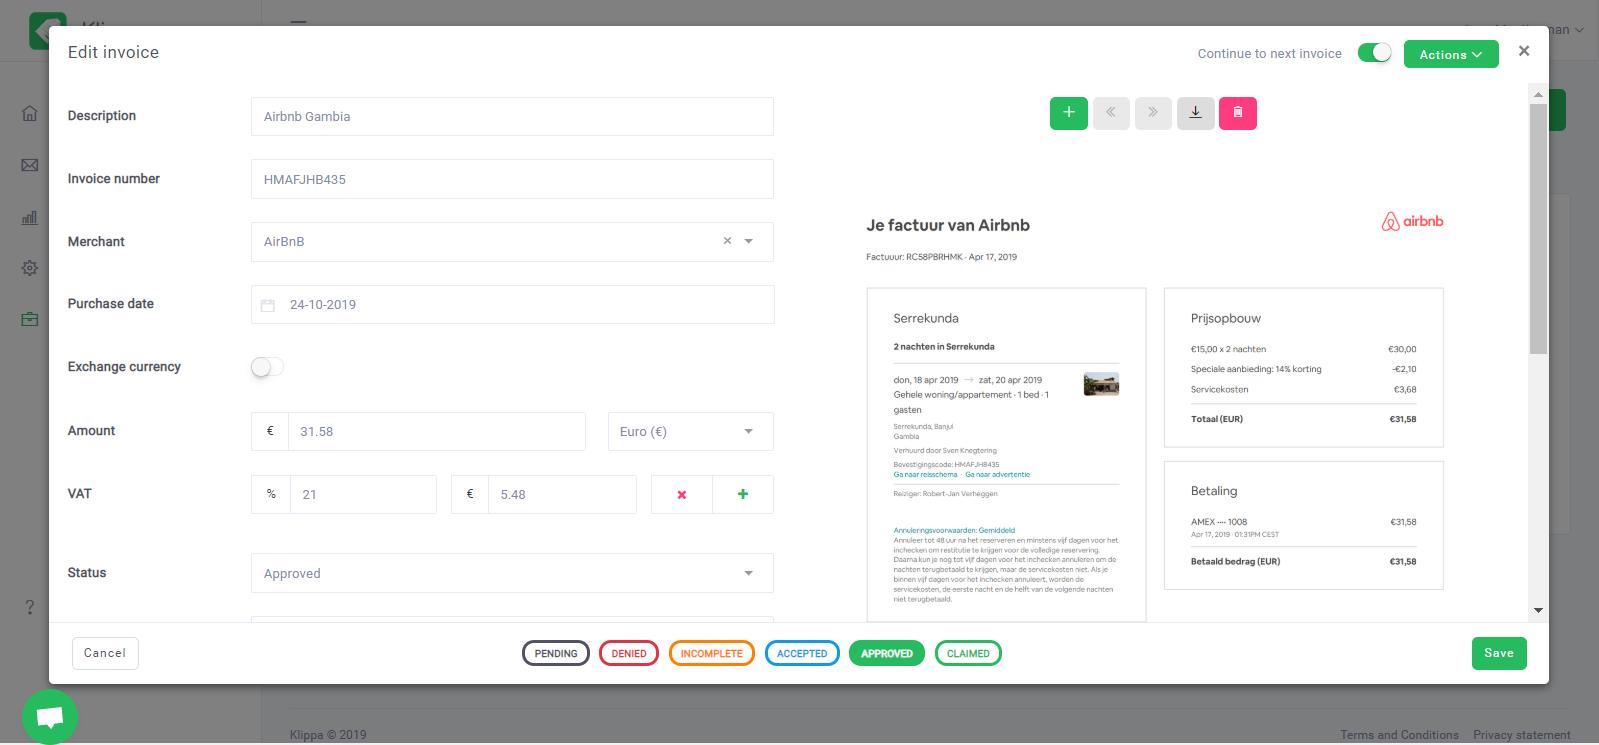 Klippa Software - Klippa edit invoice